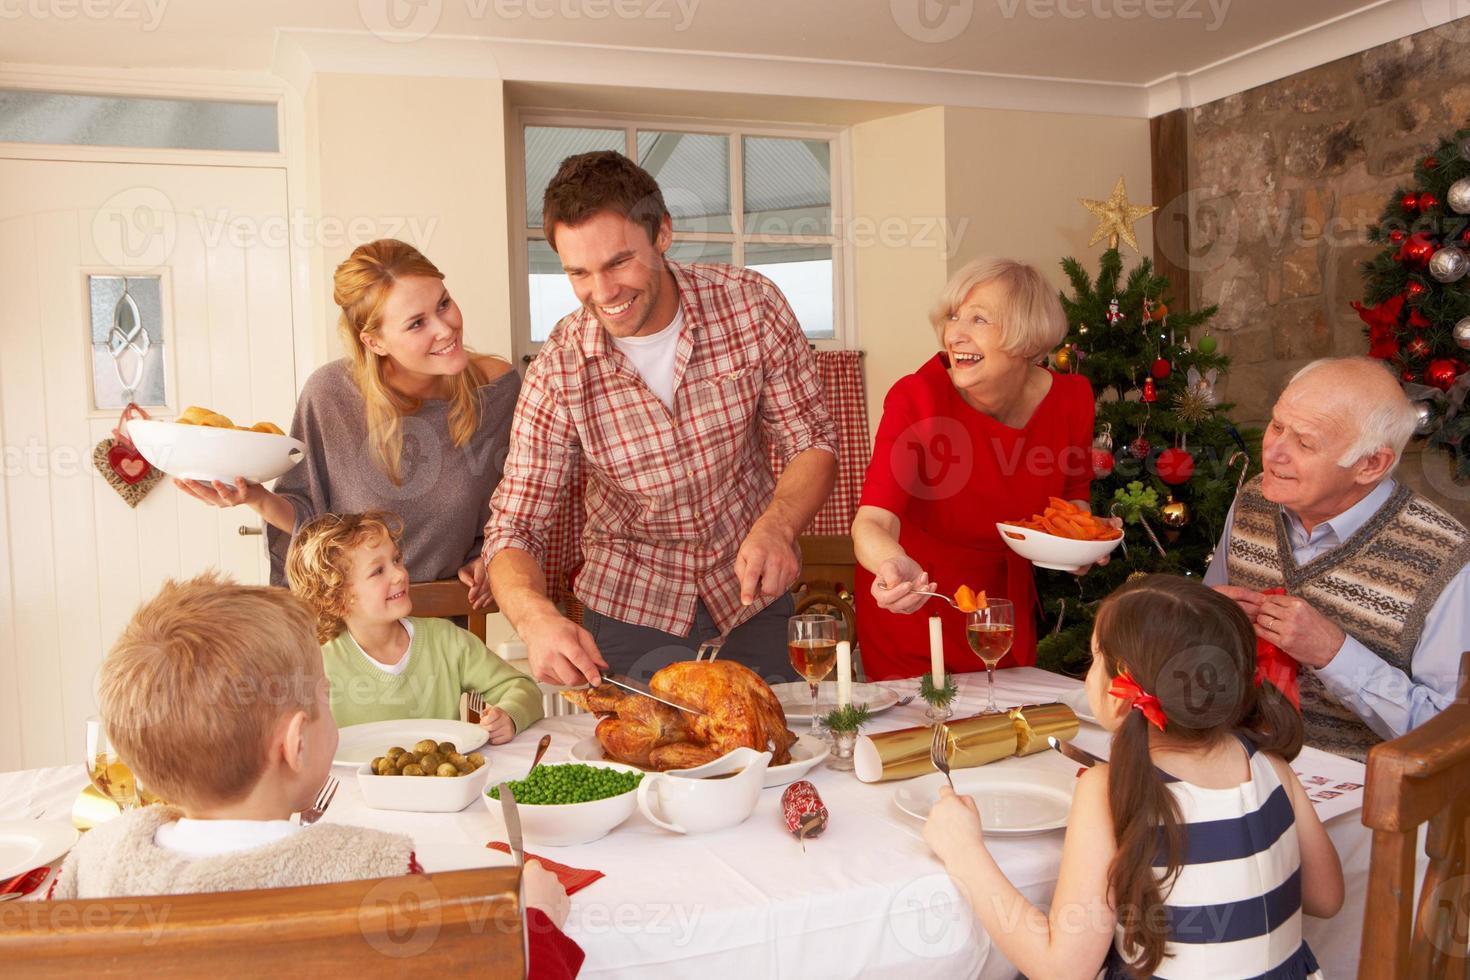 familia sirviendo cena de navidad foto